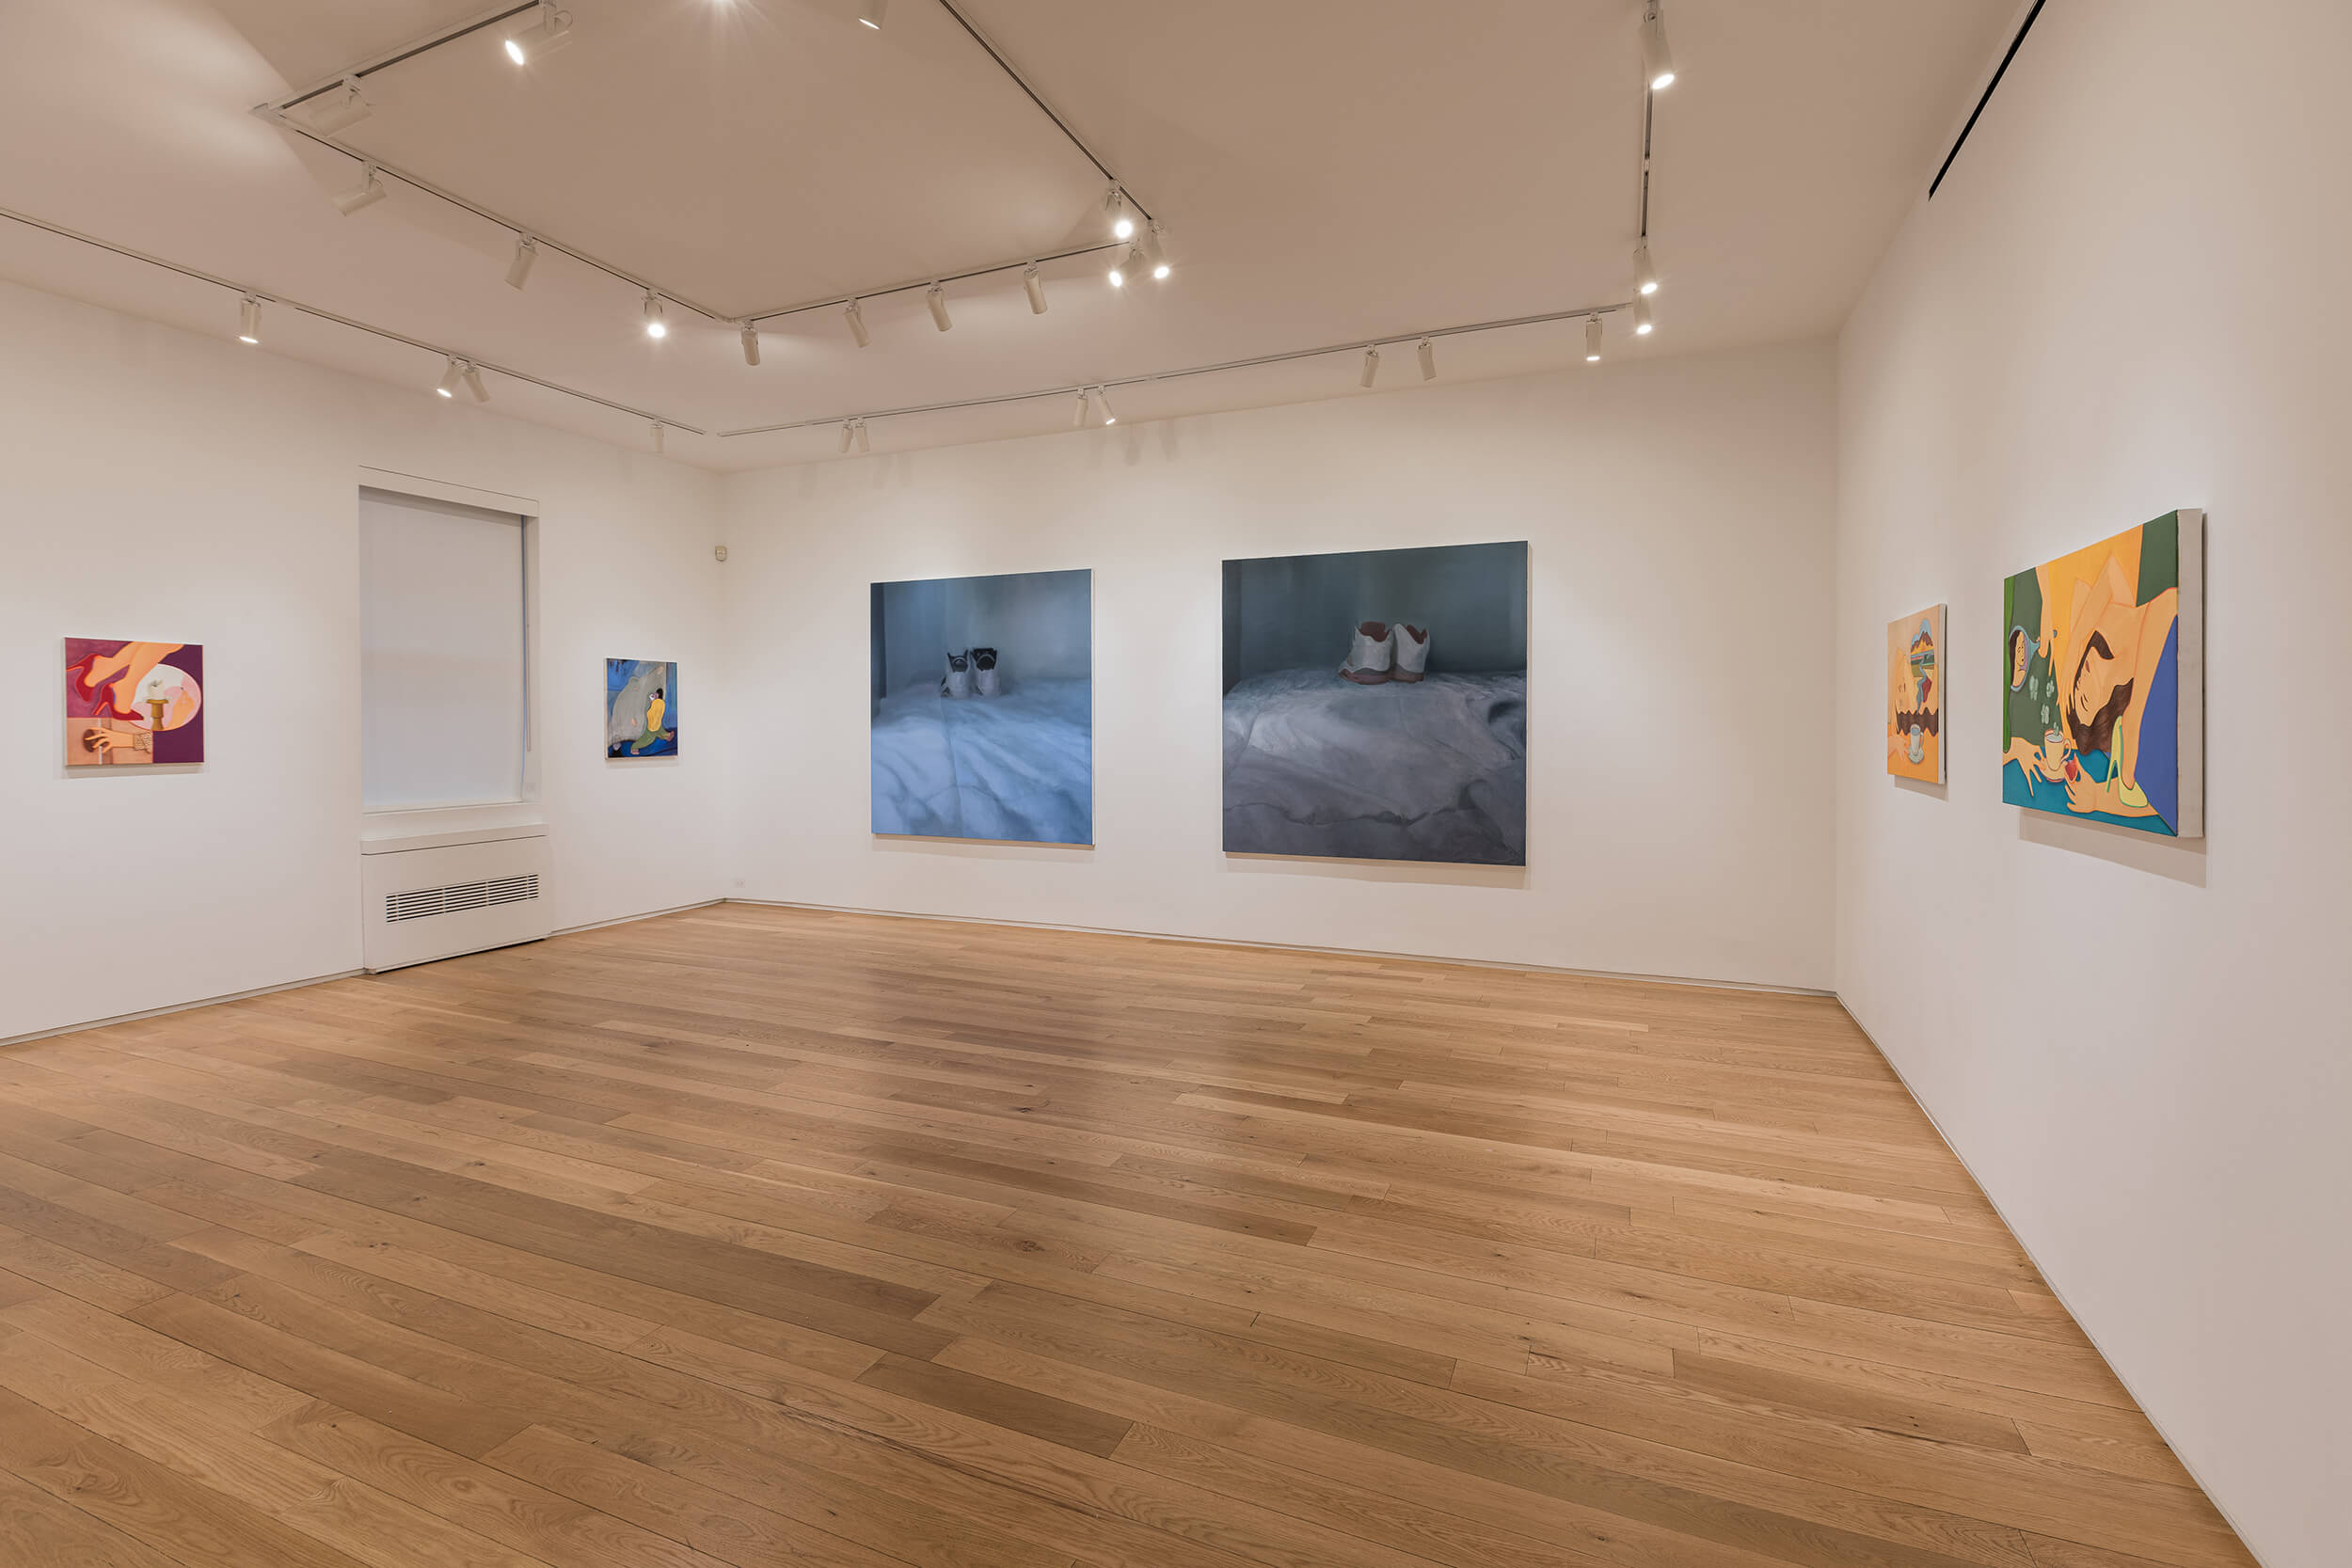 Installation view ofElana Bowsher, Vicente Matte, Gabriel Mills(June 2–July 14, 2021) at Alexander Berggruen, NY.